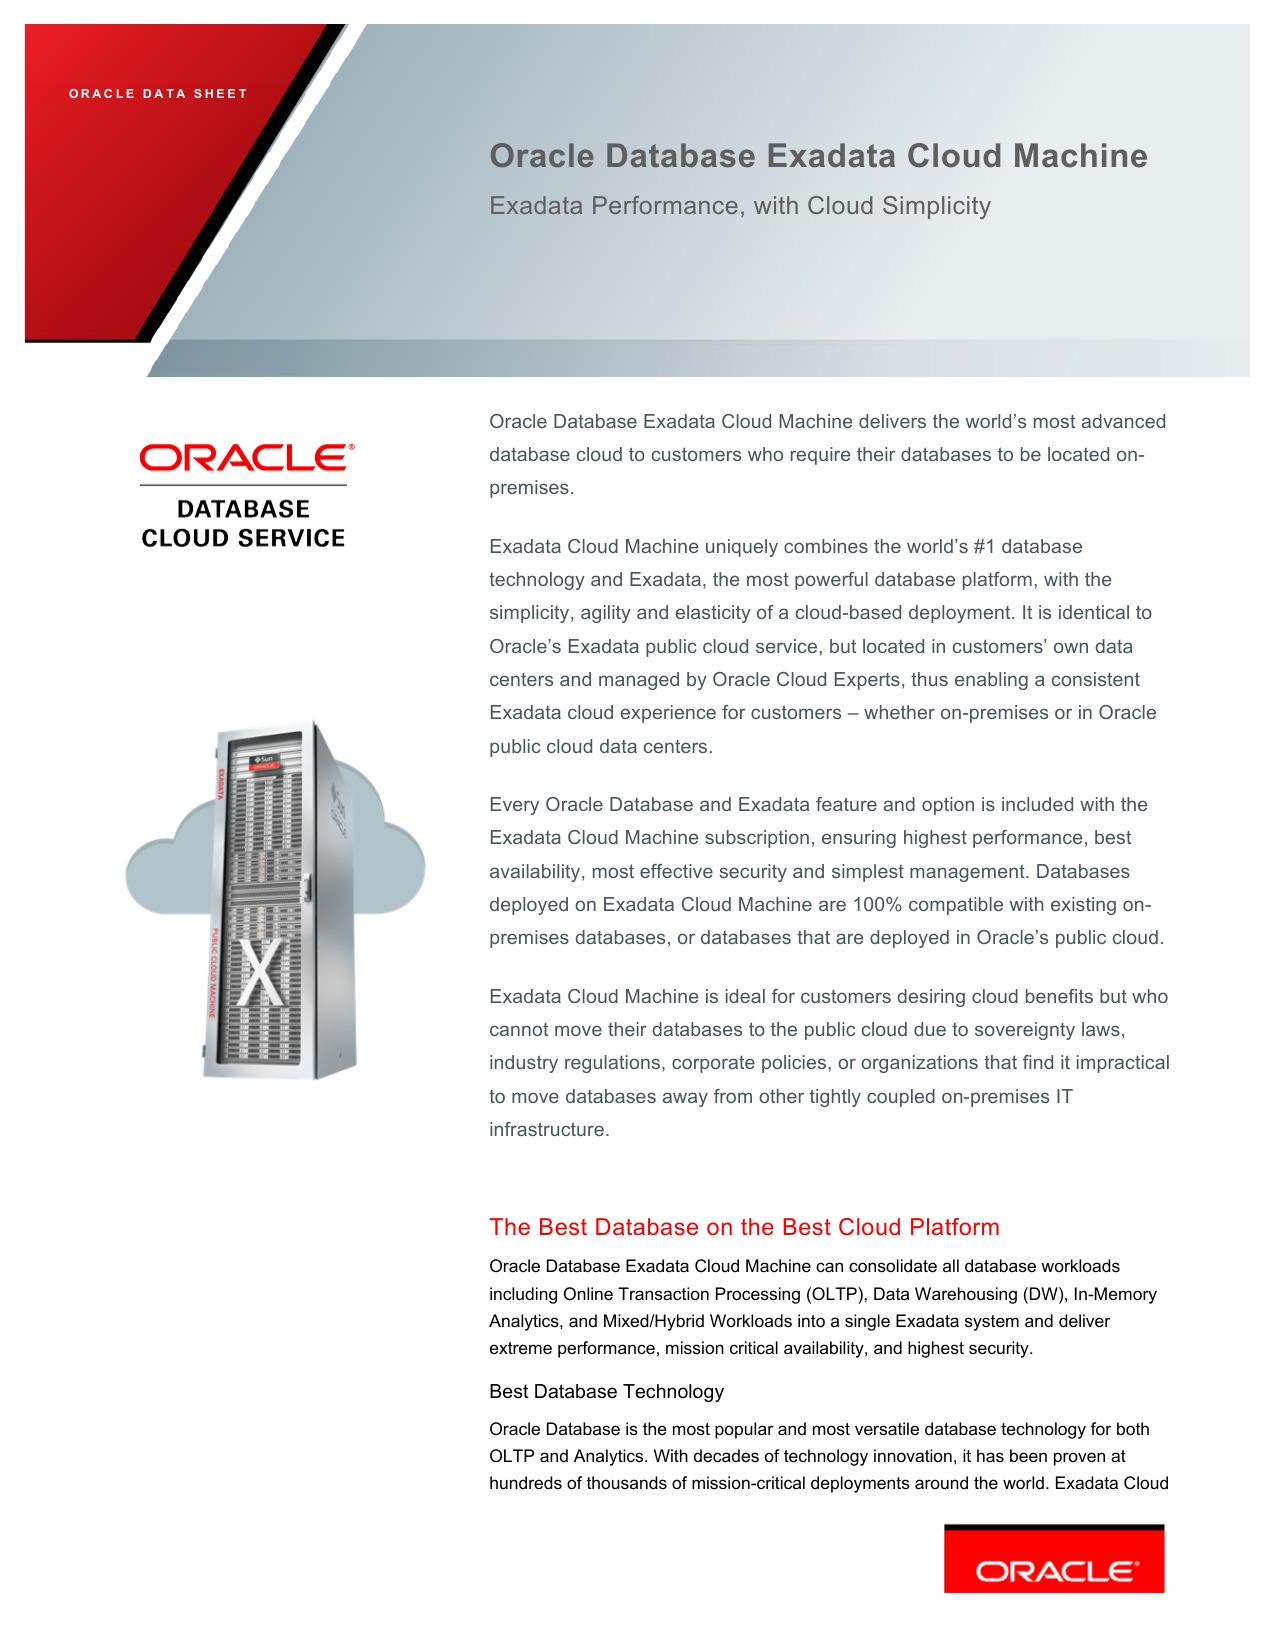 Data sheet: Oracle Database Exadata Cloud Machine   manualzz com